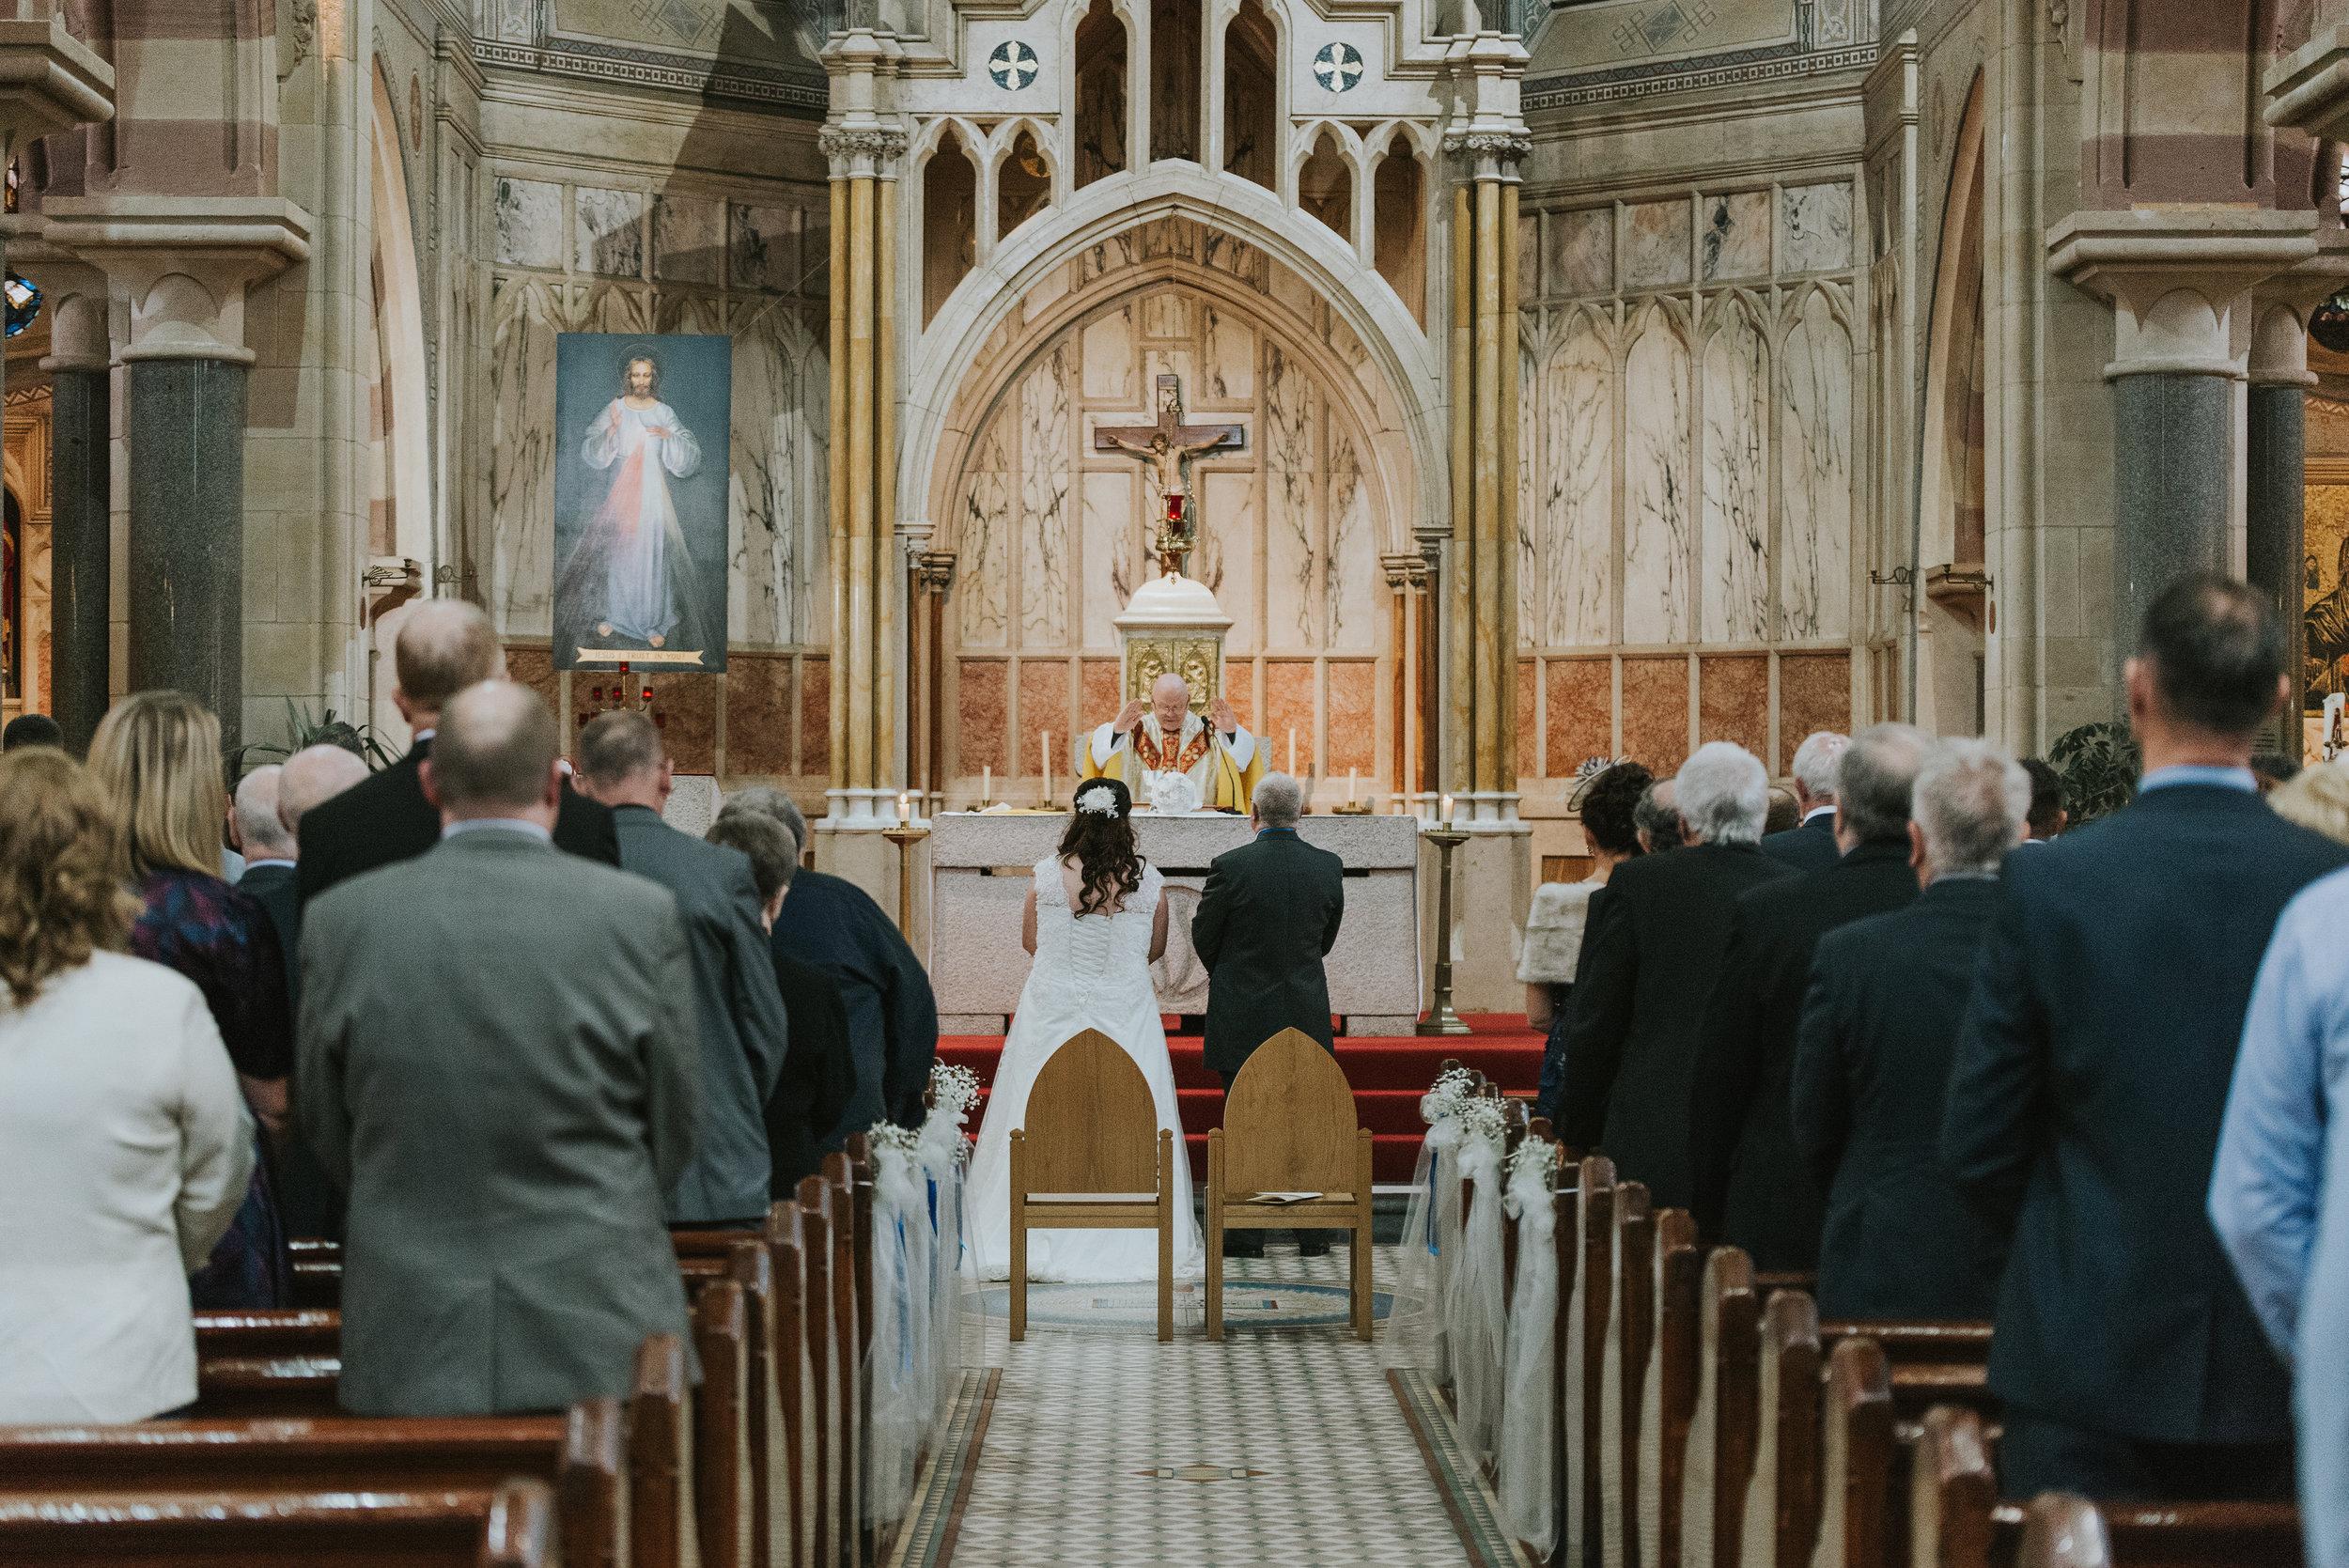 St. Pauls belfast wedding photographer pure photo n.i end of ceremony